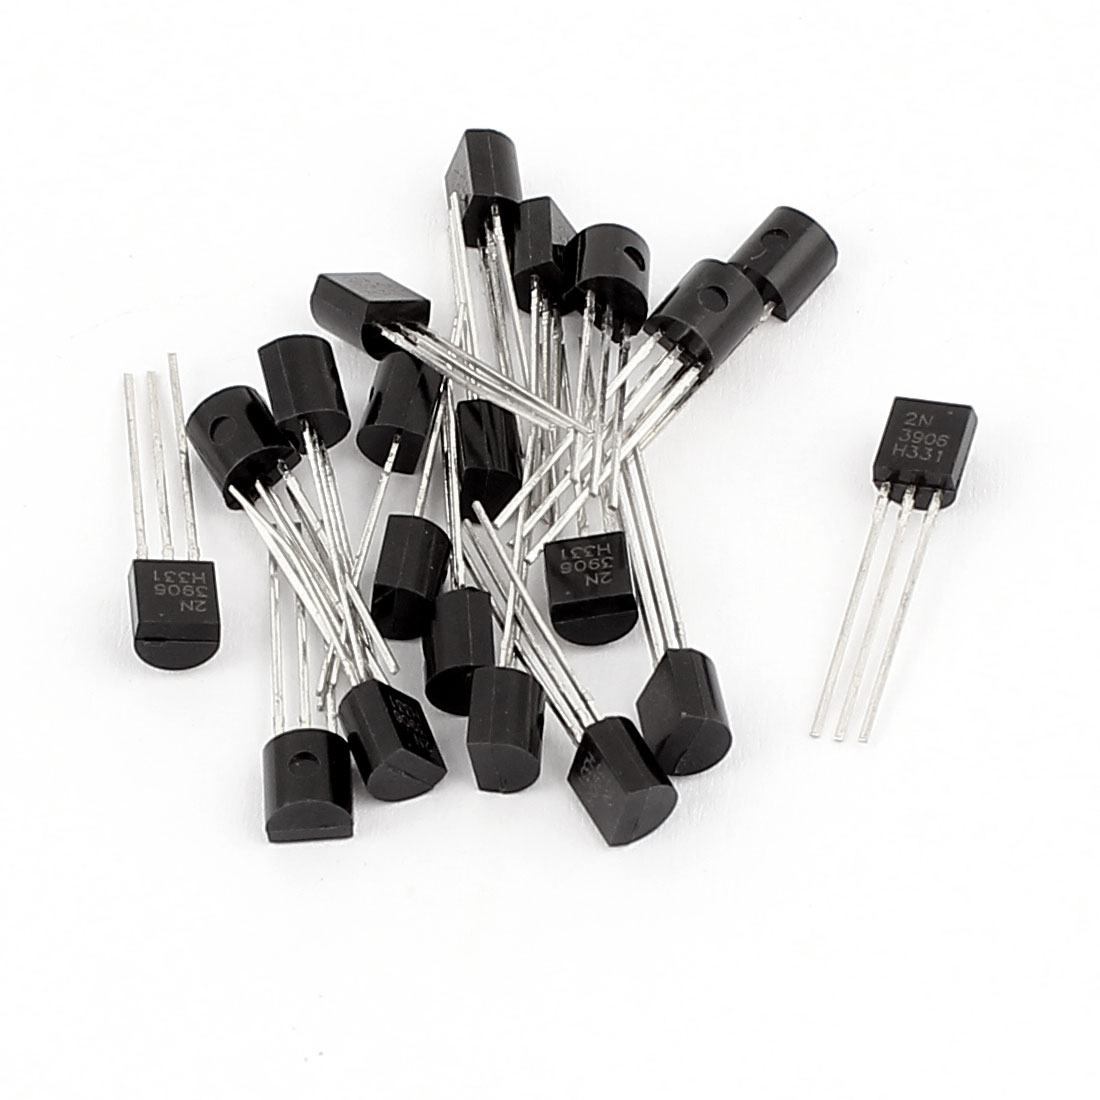 20 Pcs 2N3906 TO-92 PNP Low Power Bipolar Junction Transistors 40V 0.2A